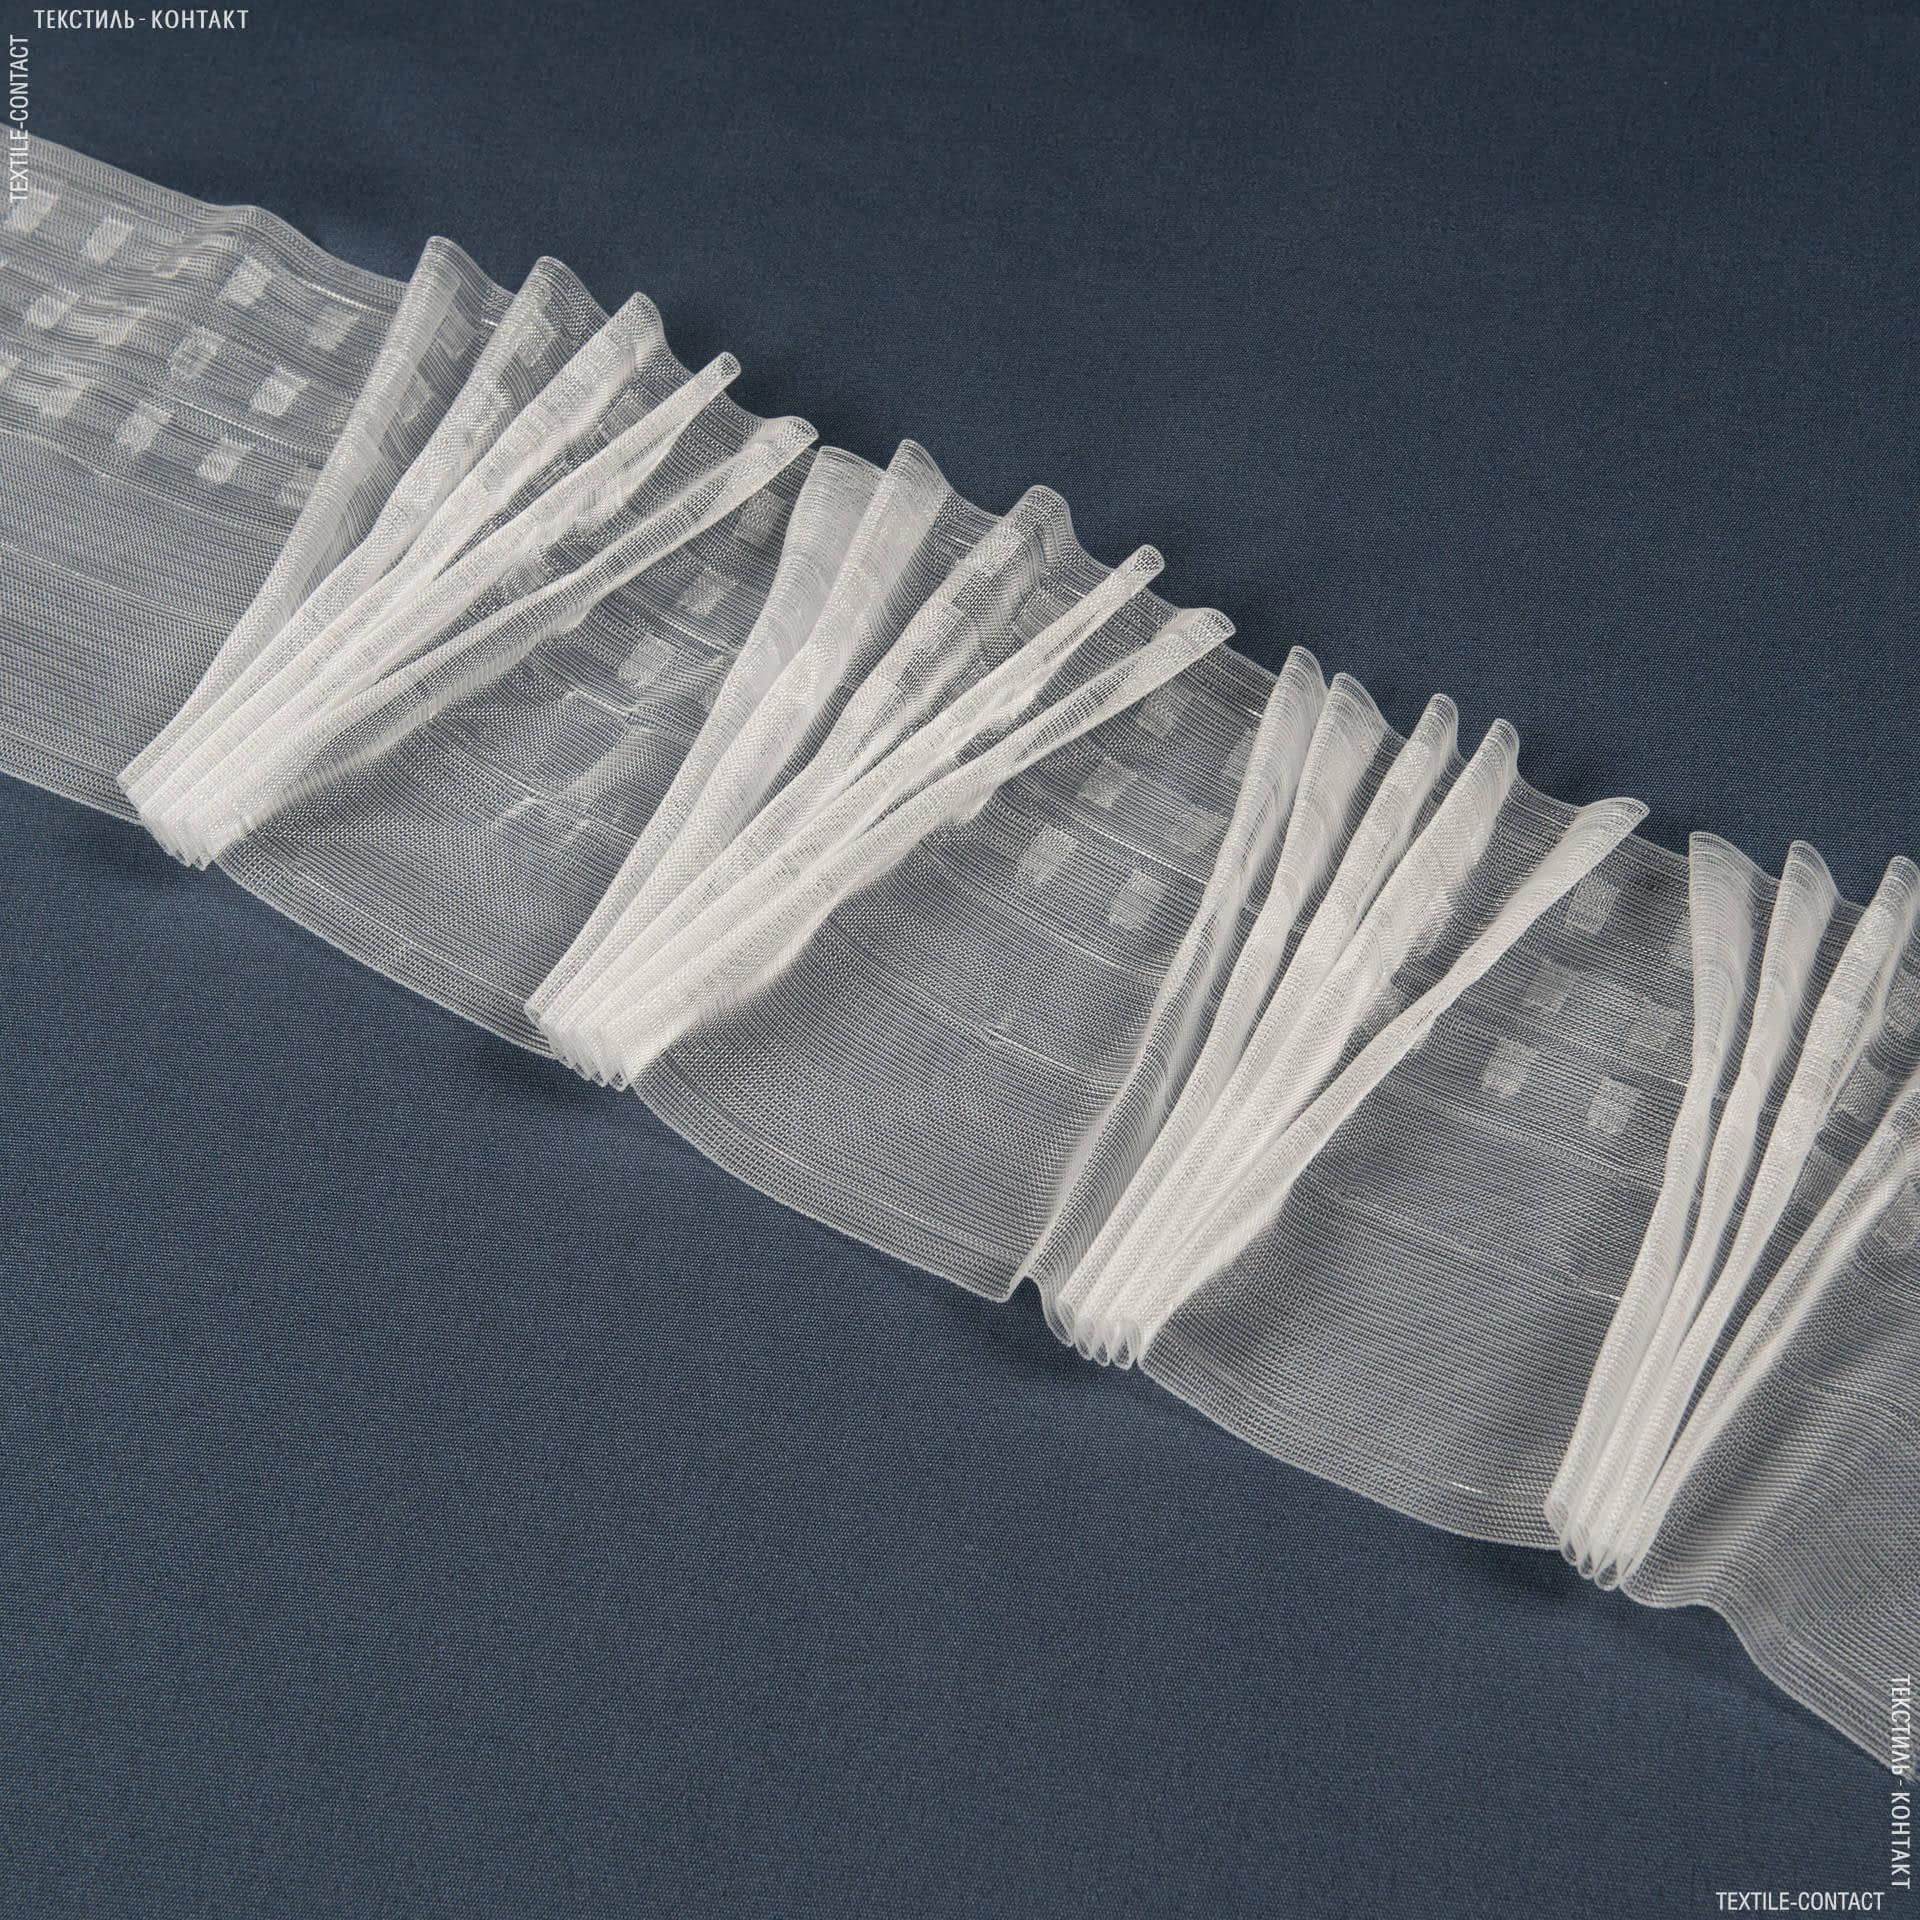 Ткани фурнитура для дома - ТЕСЬМА ШТОРНАЯ КС-1:3 170мм±0.5мм/50м прозрачная Веер